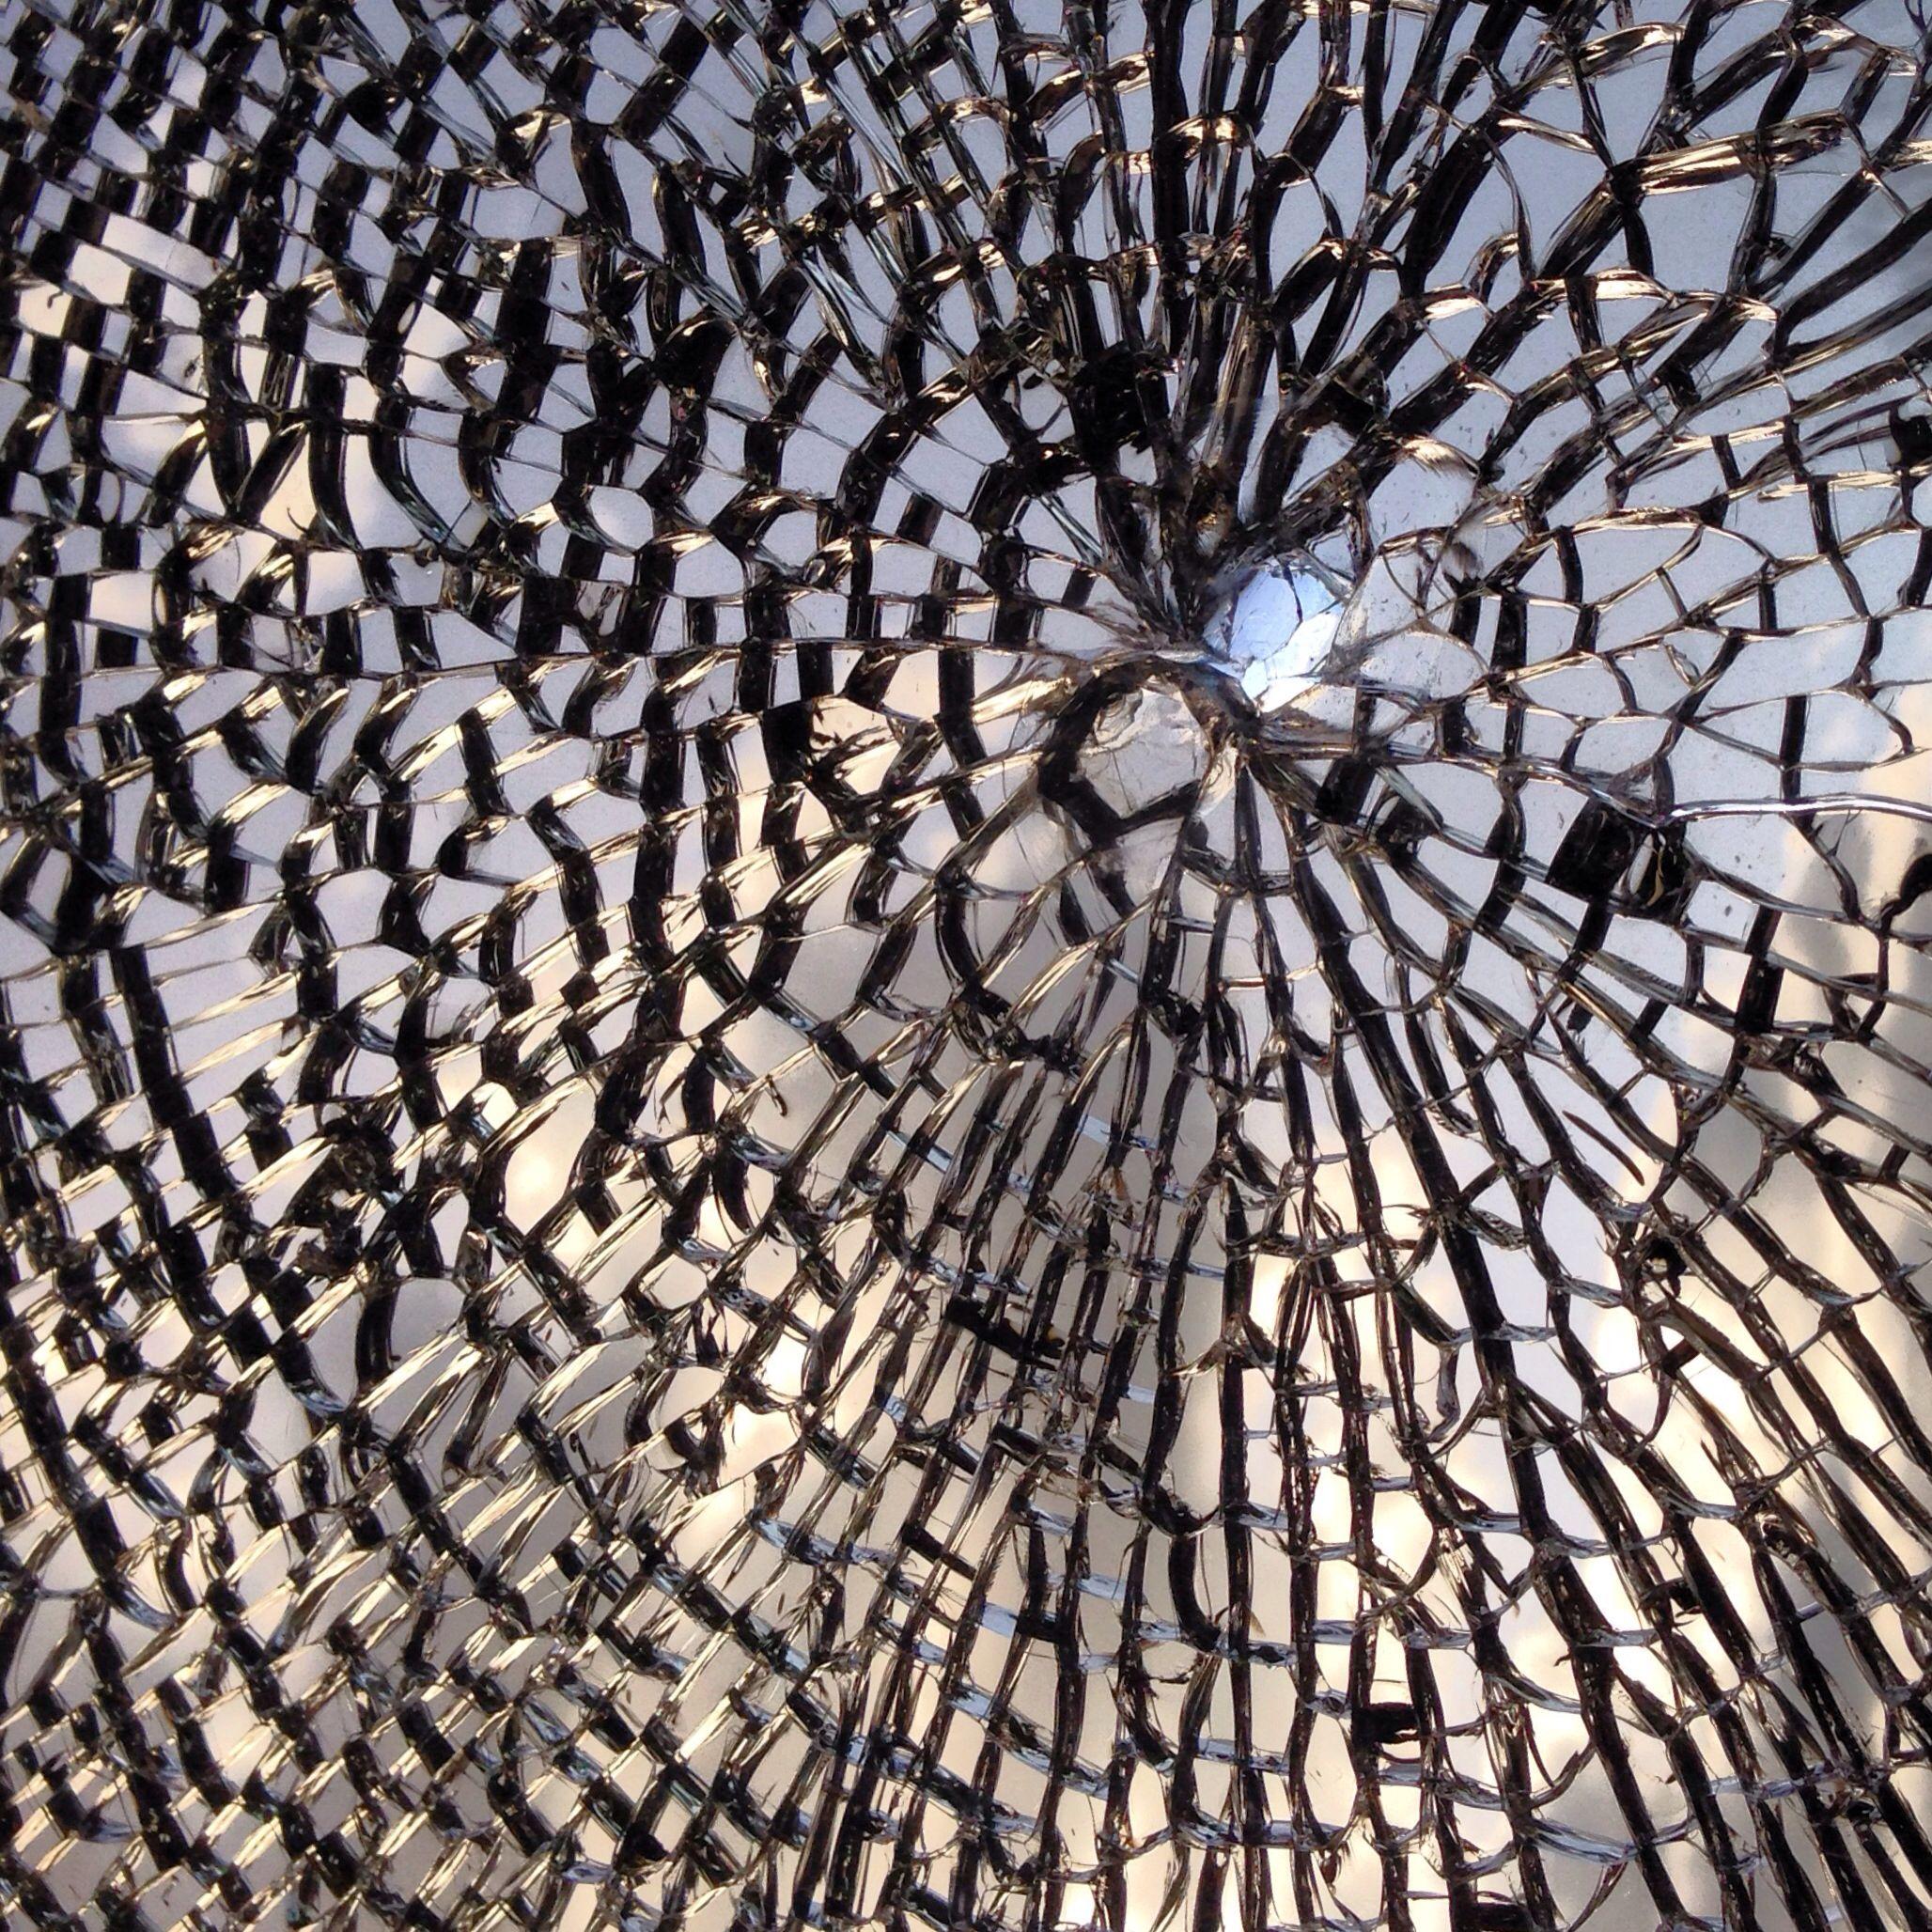 Broken Glass Textures Patterns Photo Art Tactile Texture